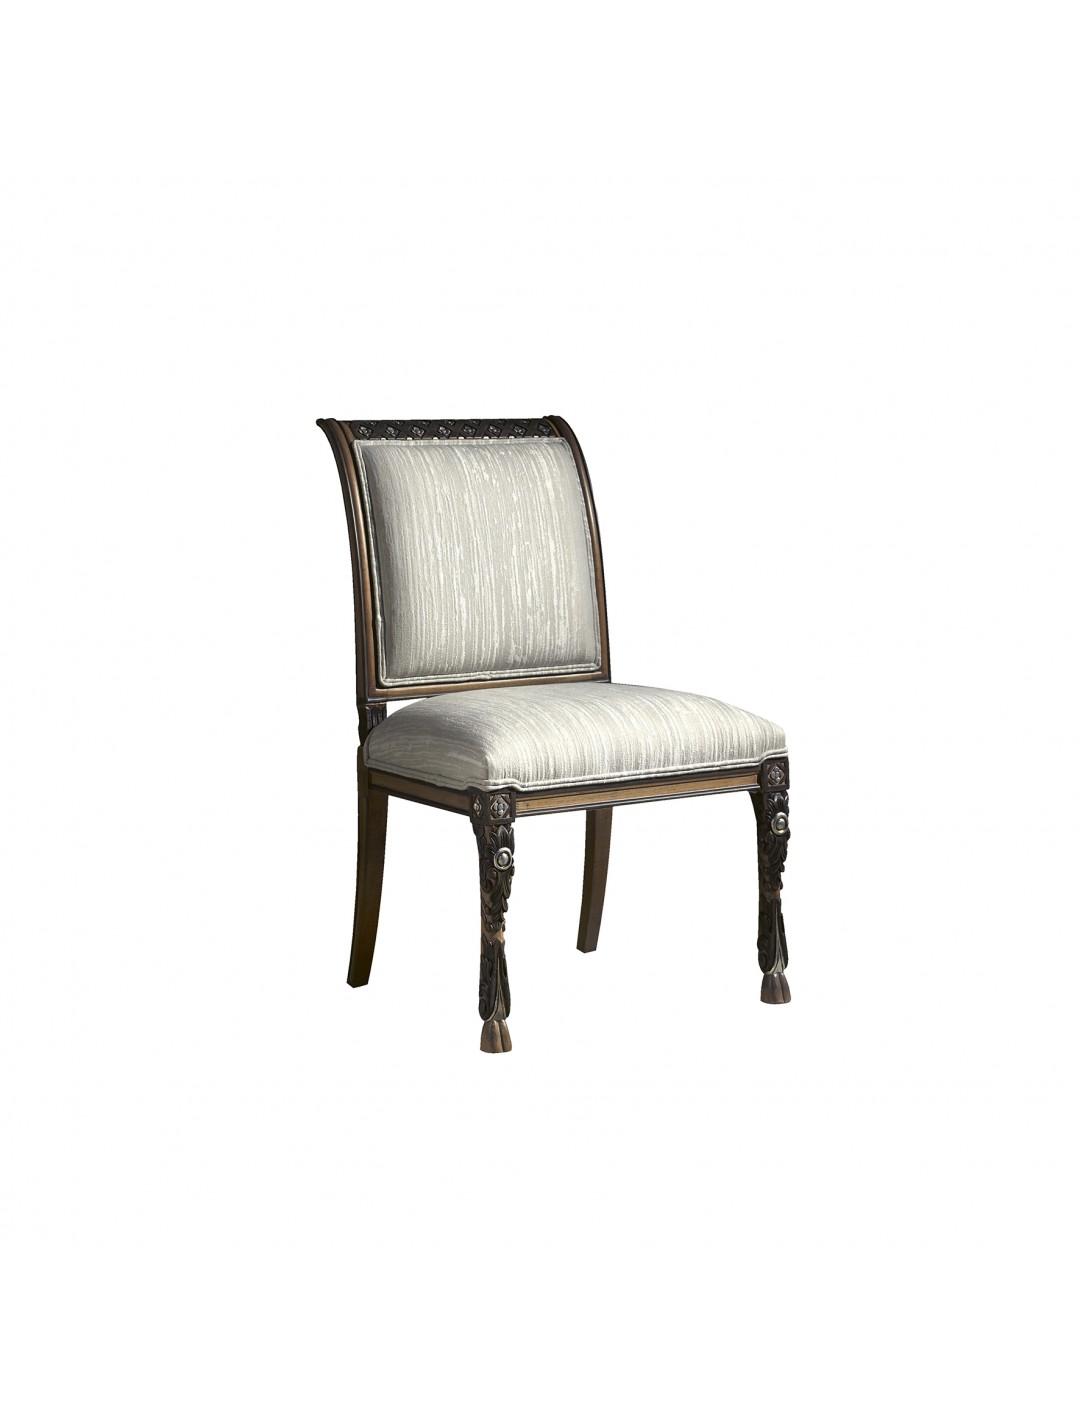 Juan Carlos Dining Chair C O M